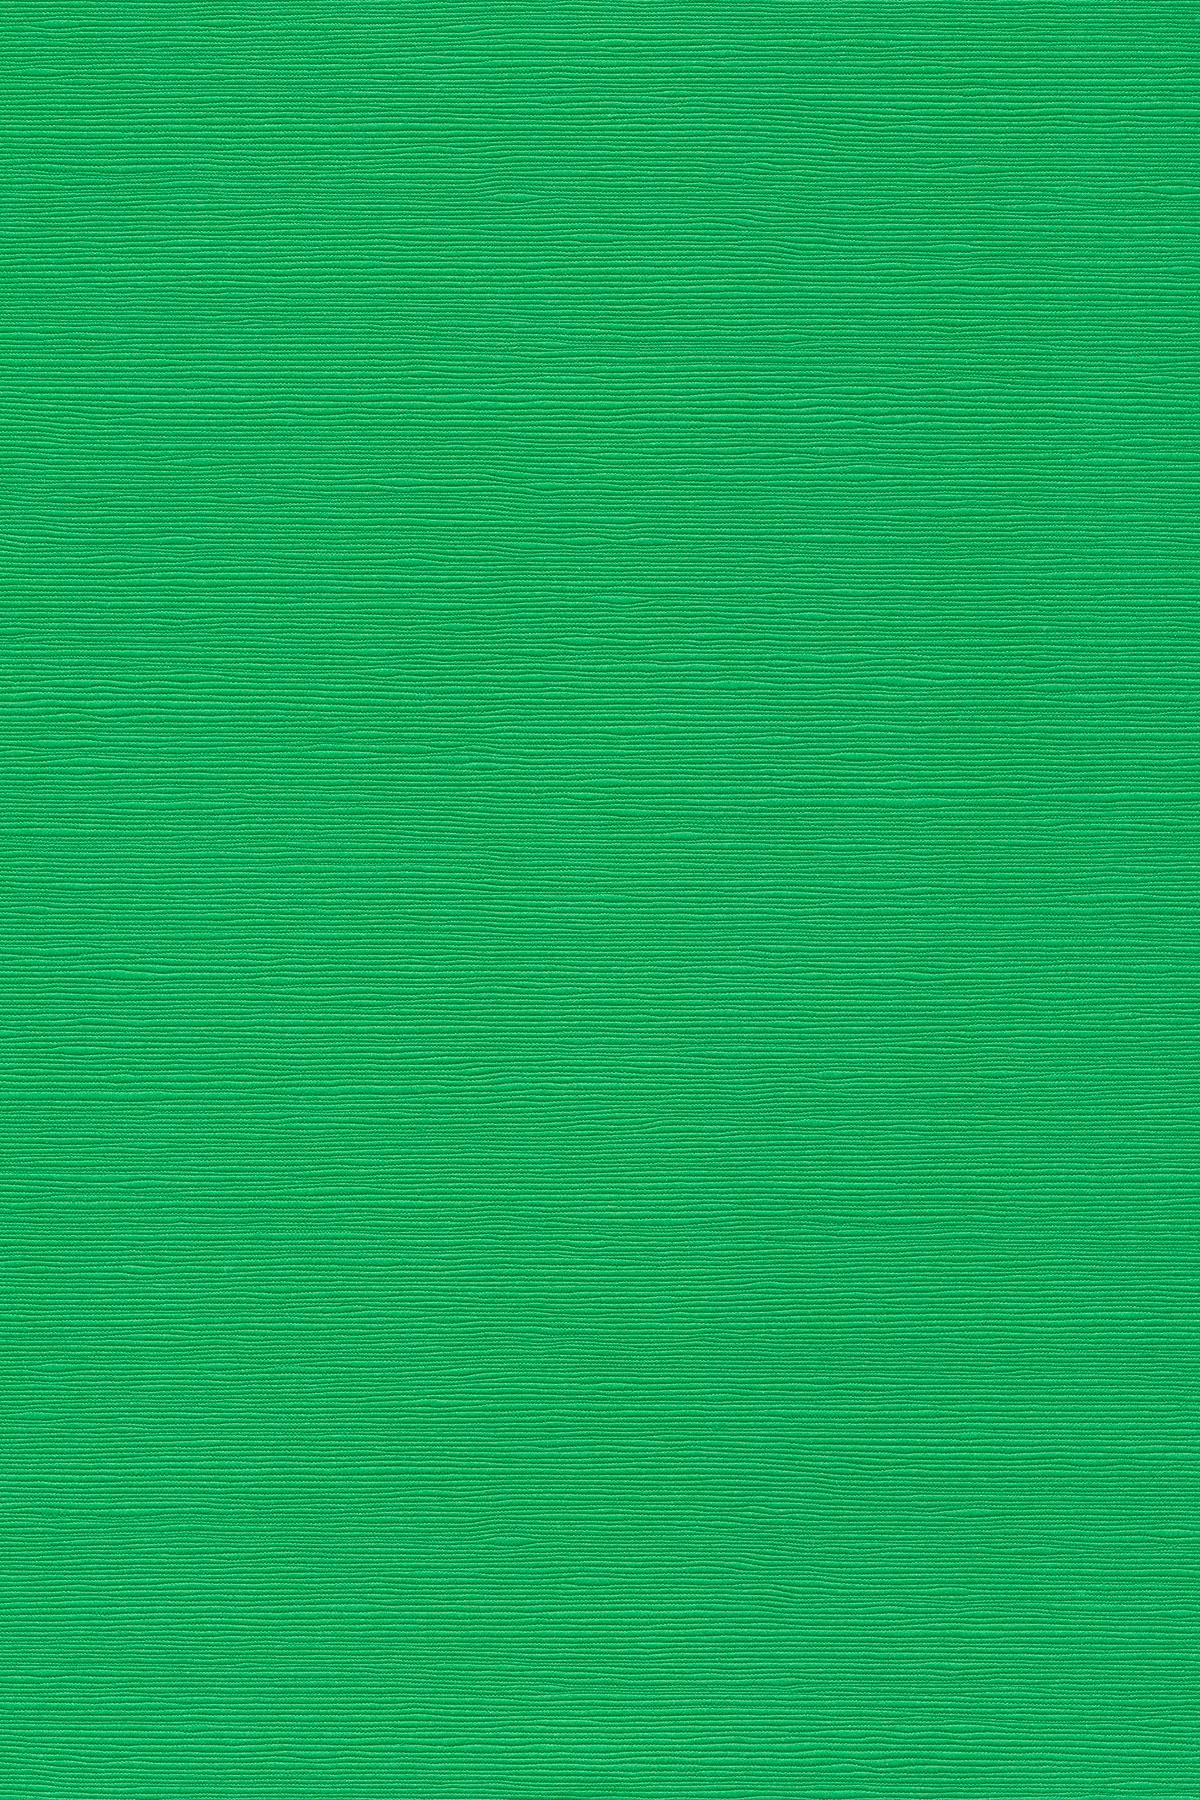 Japanese linen paper - green photo